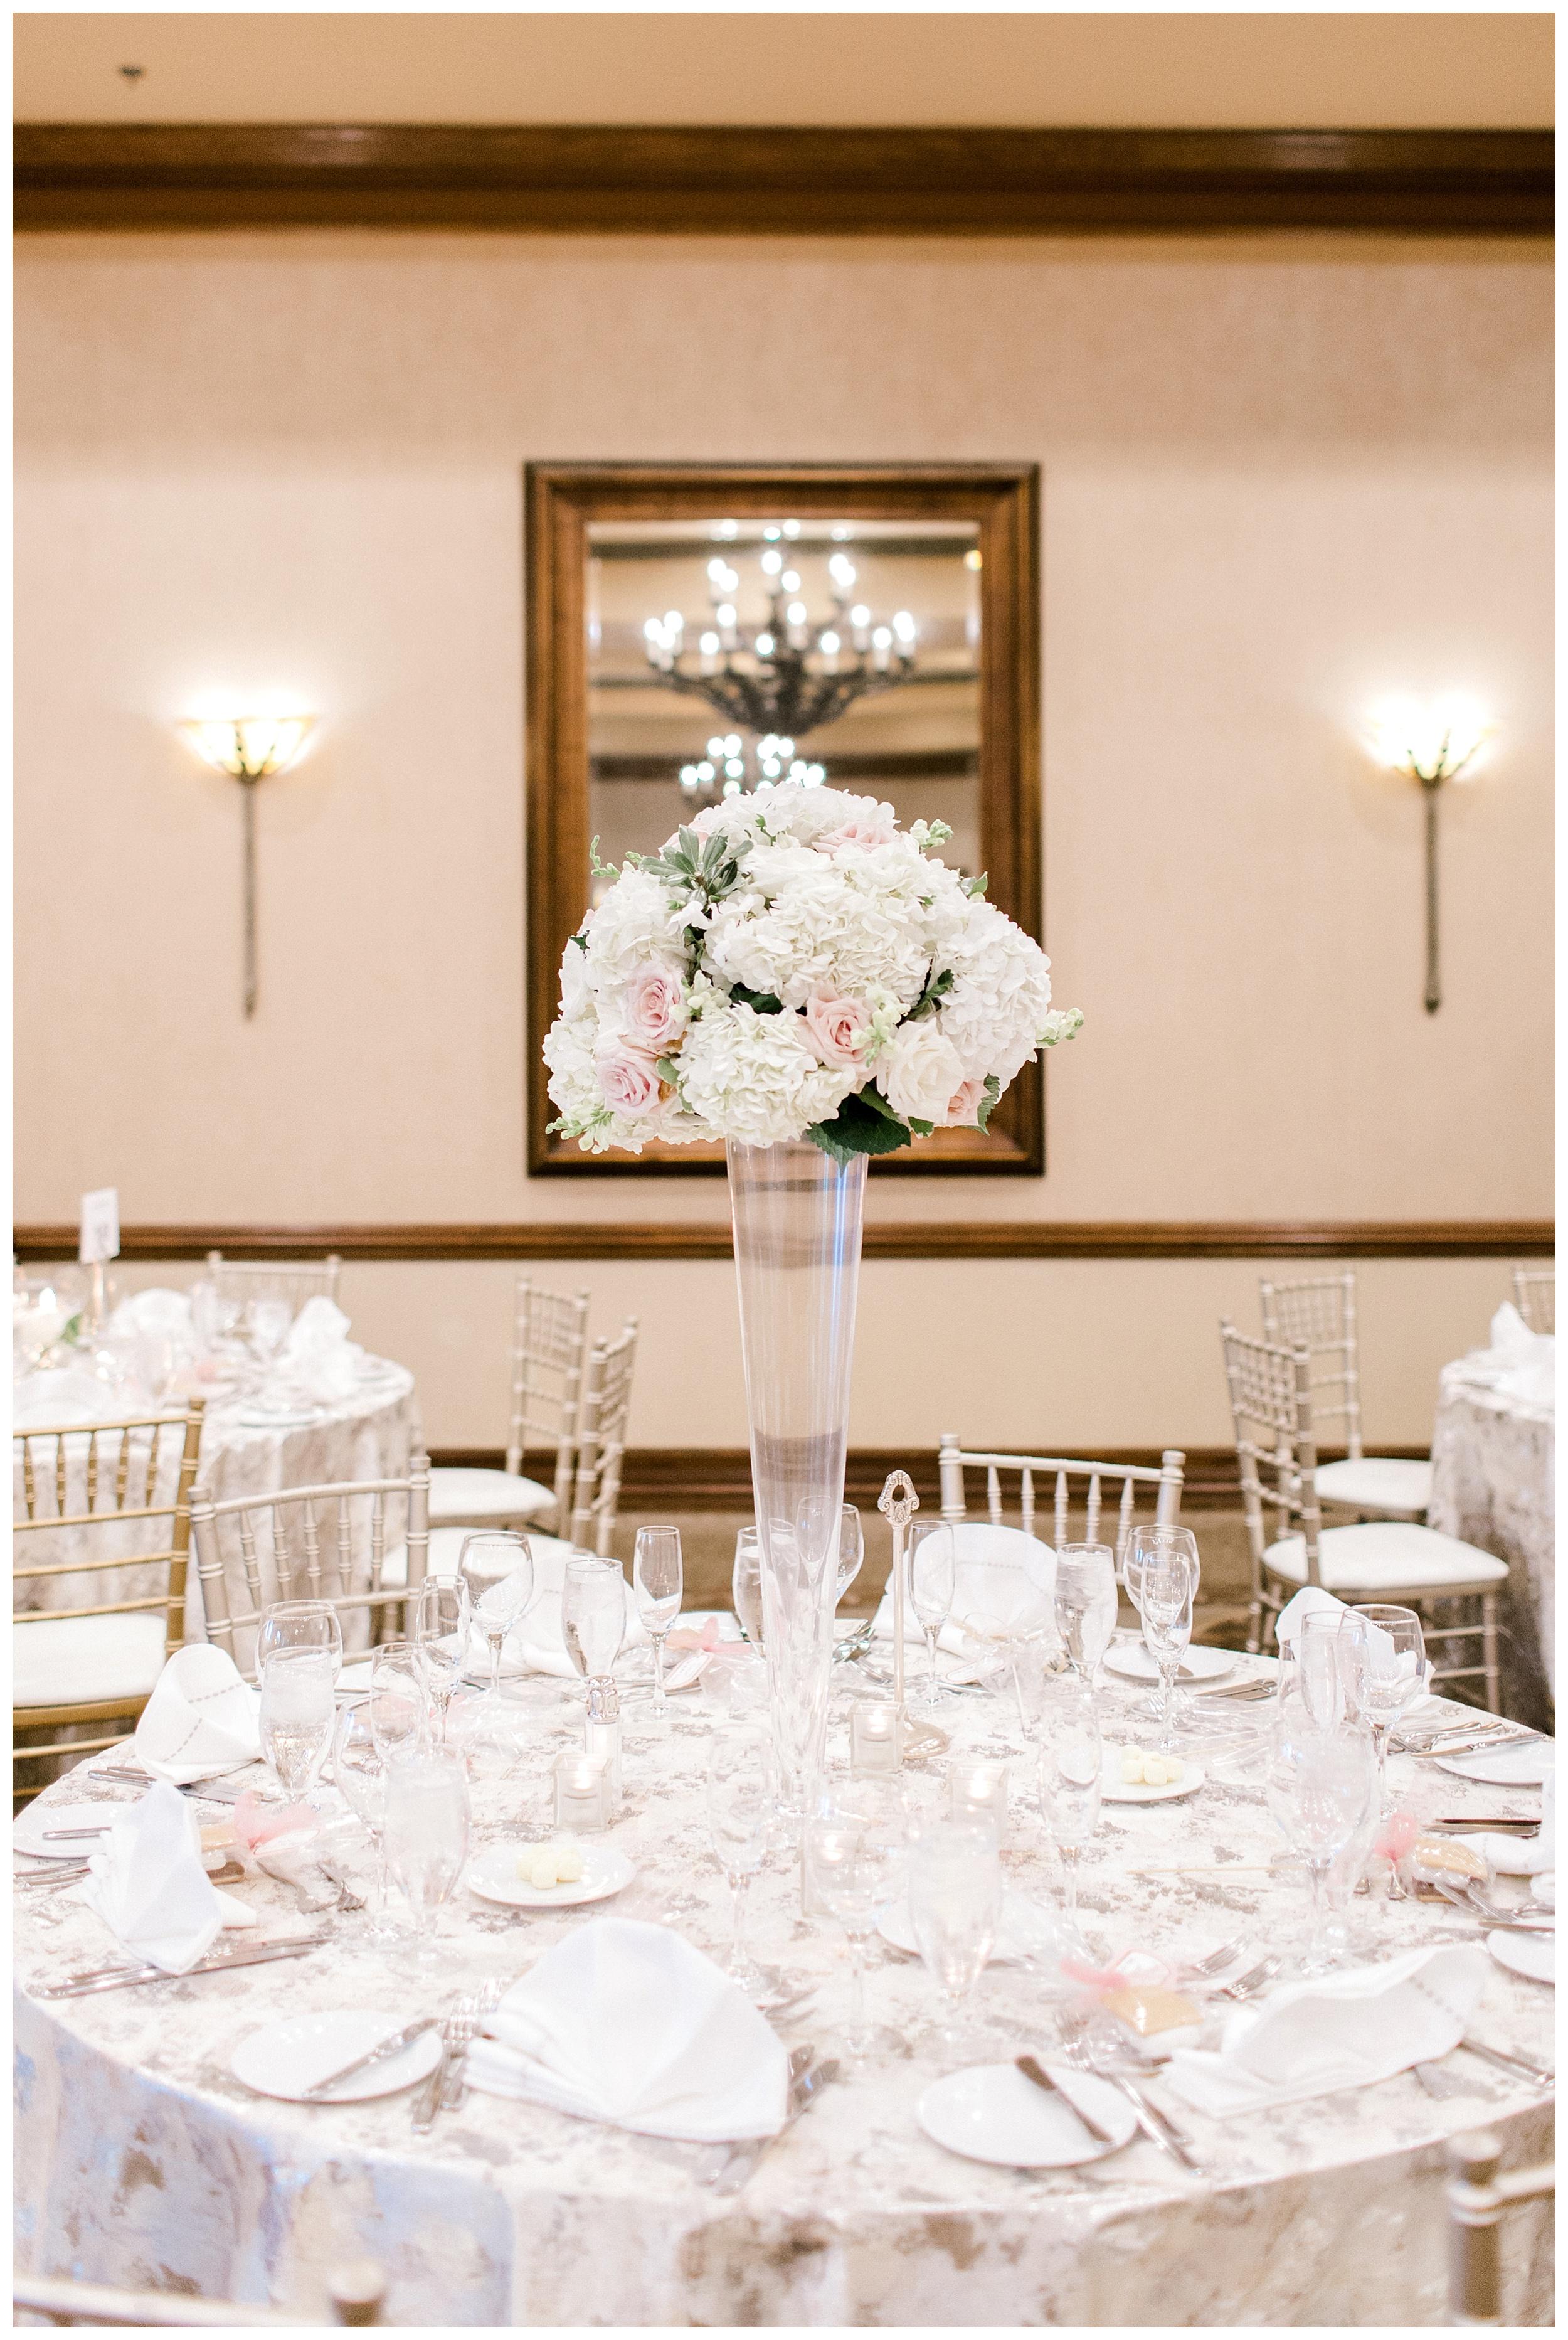 Lansdowne Resort Wedding | Virginia Film Wedding Photographer Kir Tuben_0059.jpg